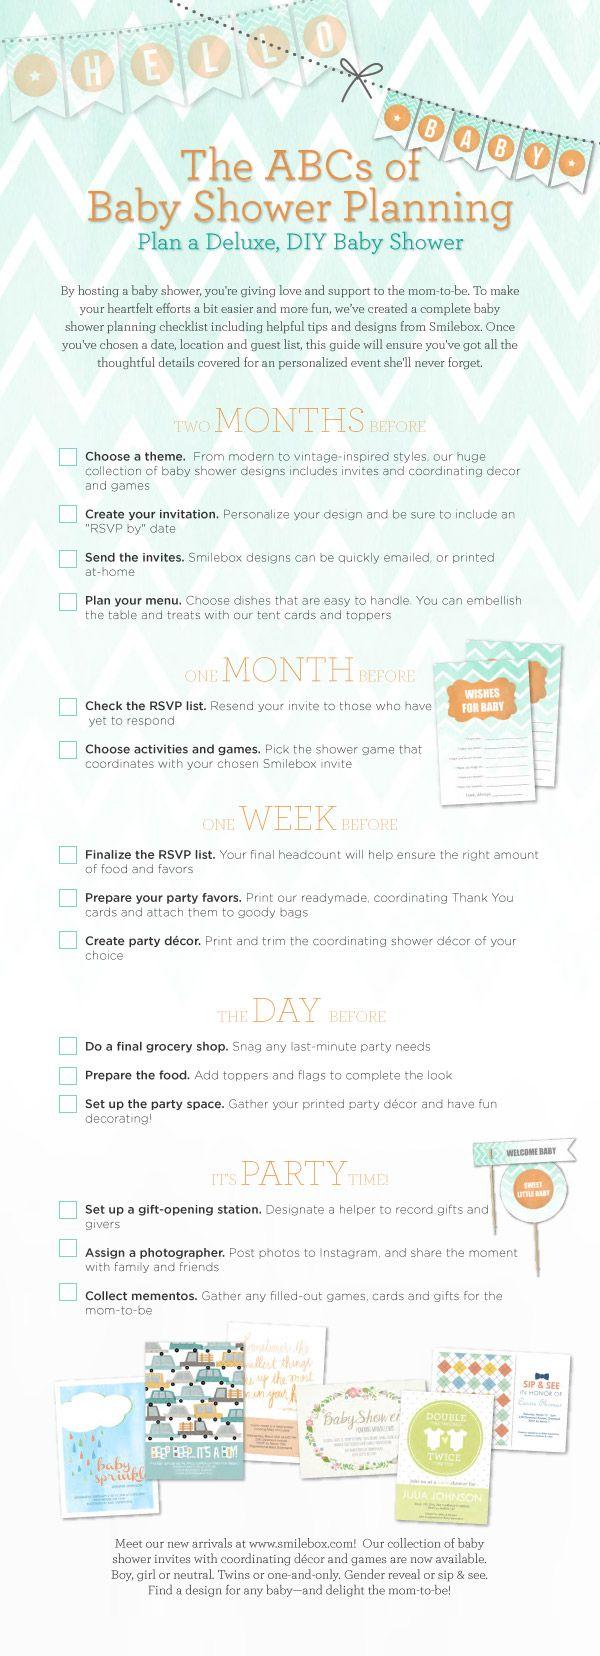 baby shower planning timeline